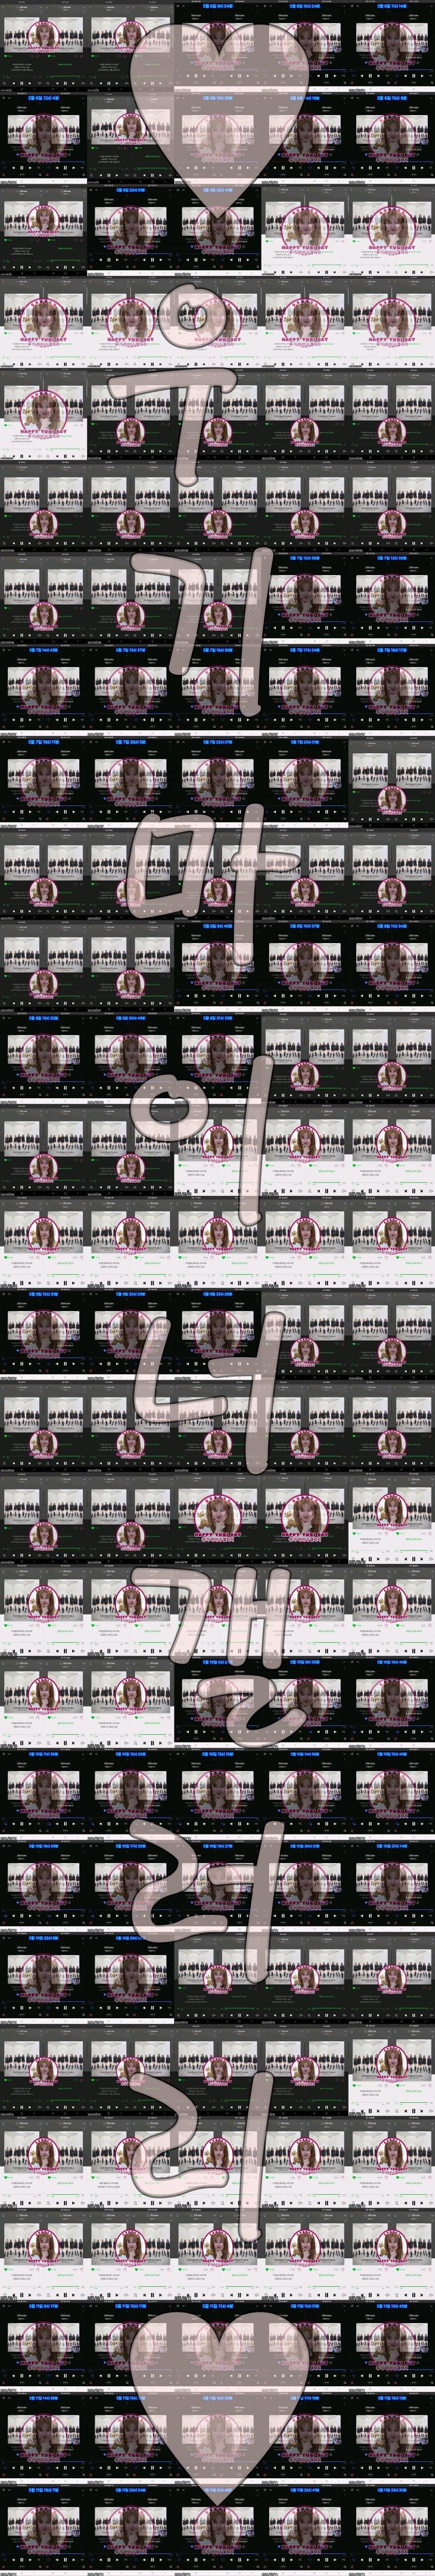 viewimage.php?id=21b2c623e9cb22&no=24b0d769e1d32ca73cec8efa11d02831ed3c848cabfee483347b0fb095ae03ce2939eb91941fefd15c79ffeca2b3e8002337bc8868d54031110c4b29573b8d2aae459f7cf0dd05e86fde7482e4046898cac7